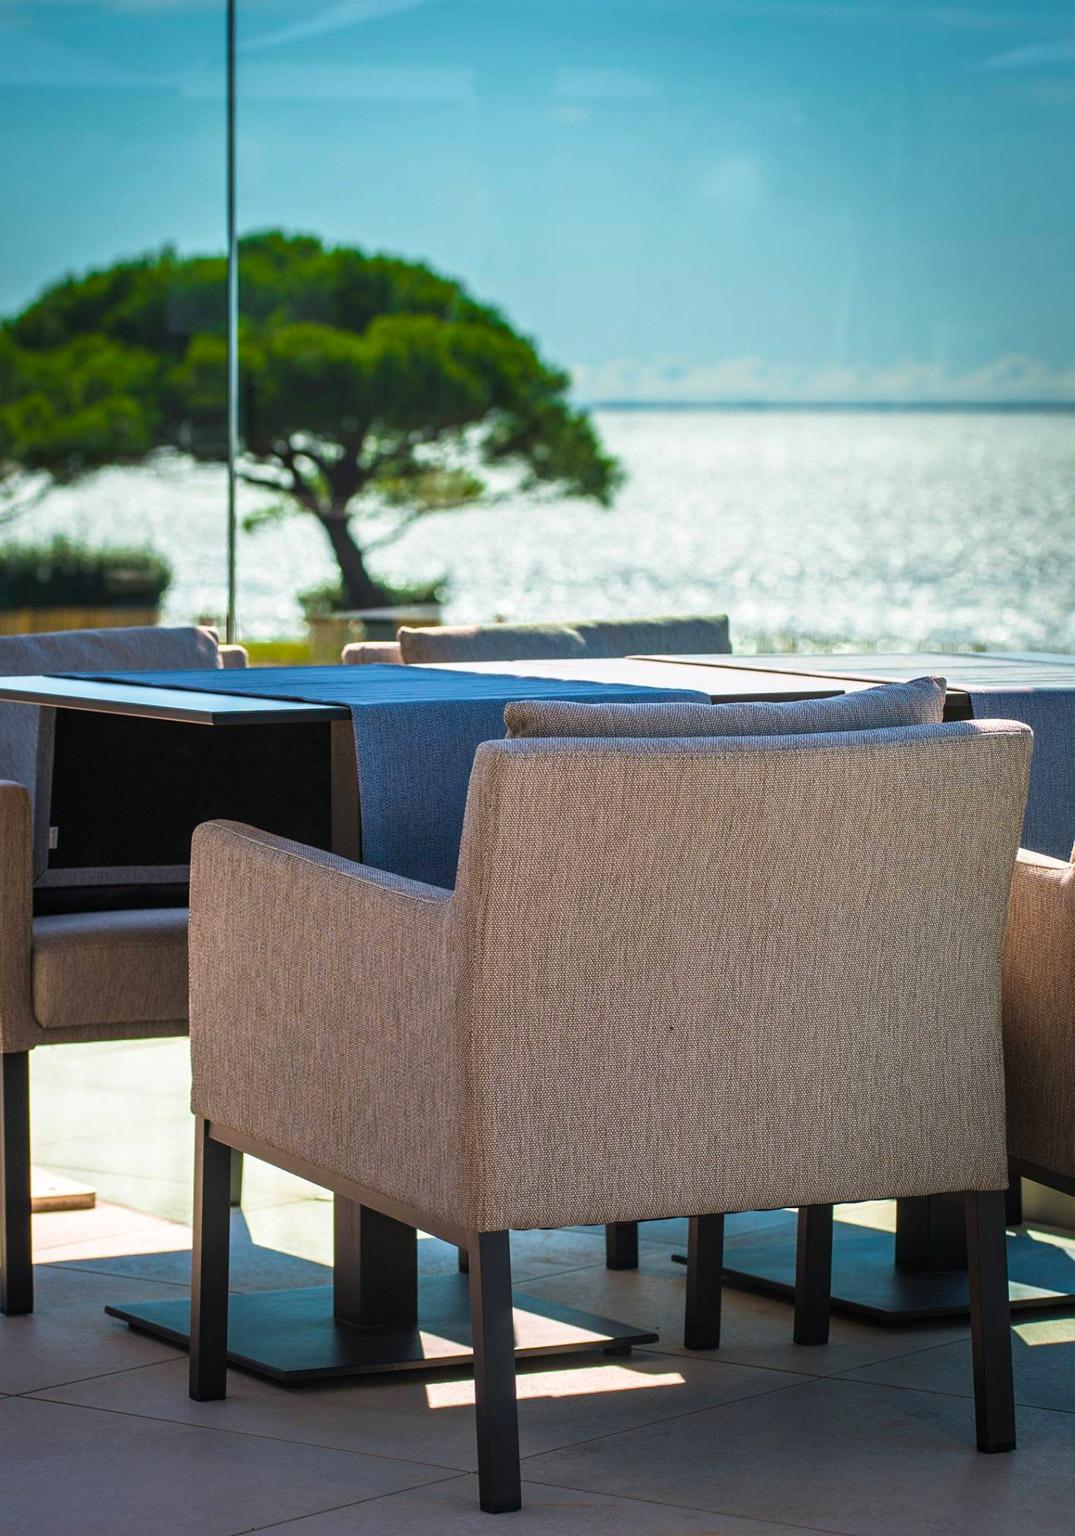 Agencement, aménagement de la terrasse du bord de mer du restaurant Gaya